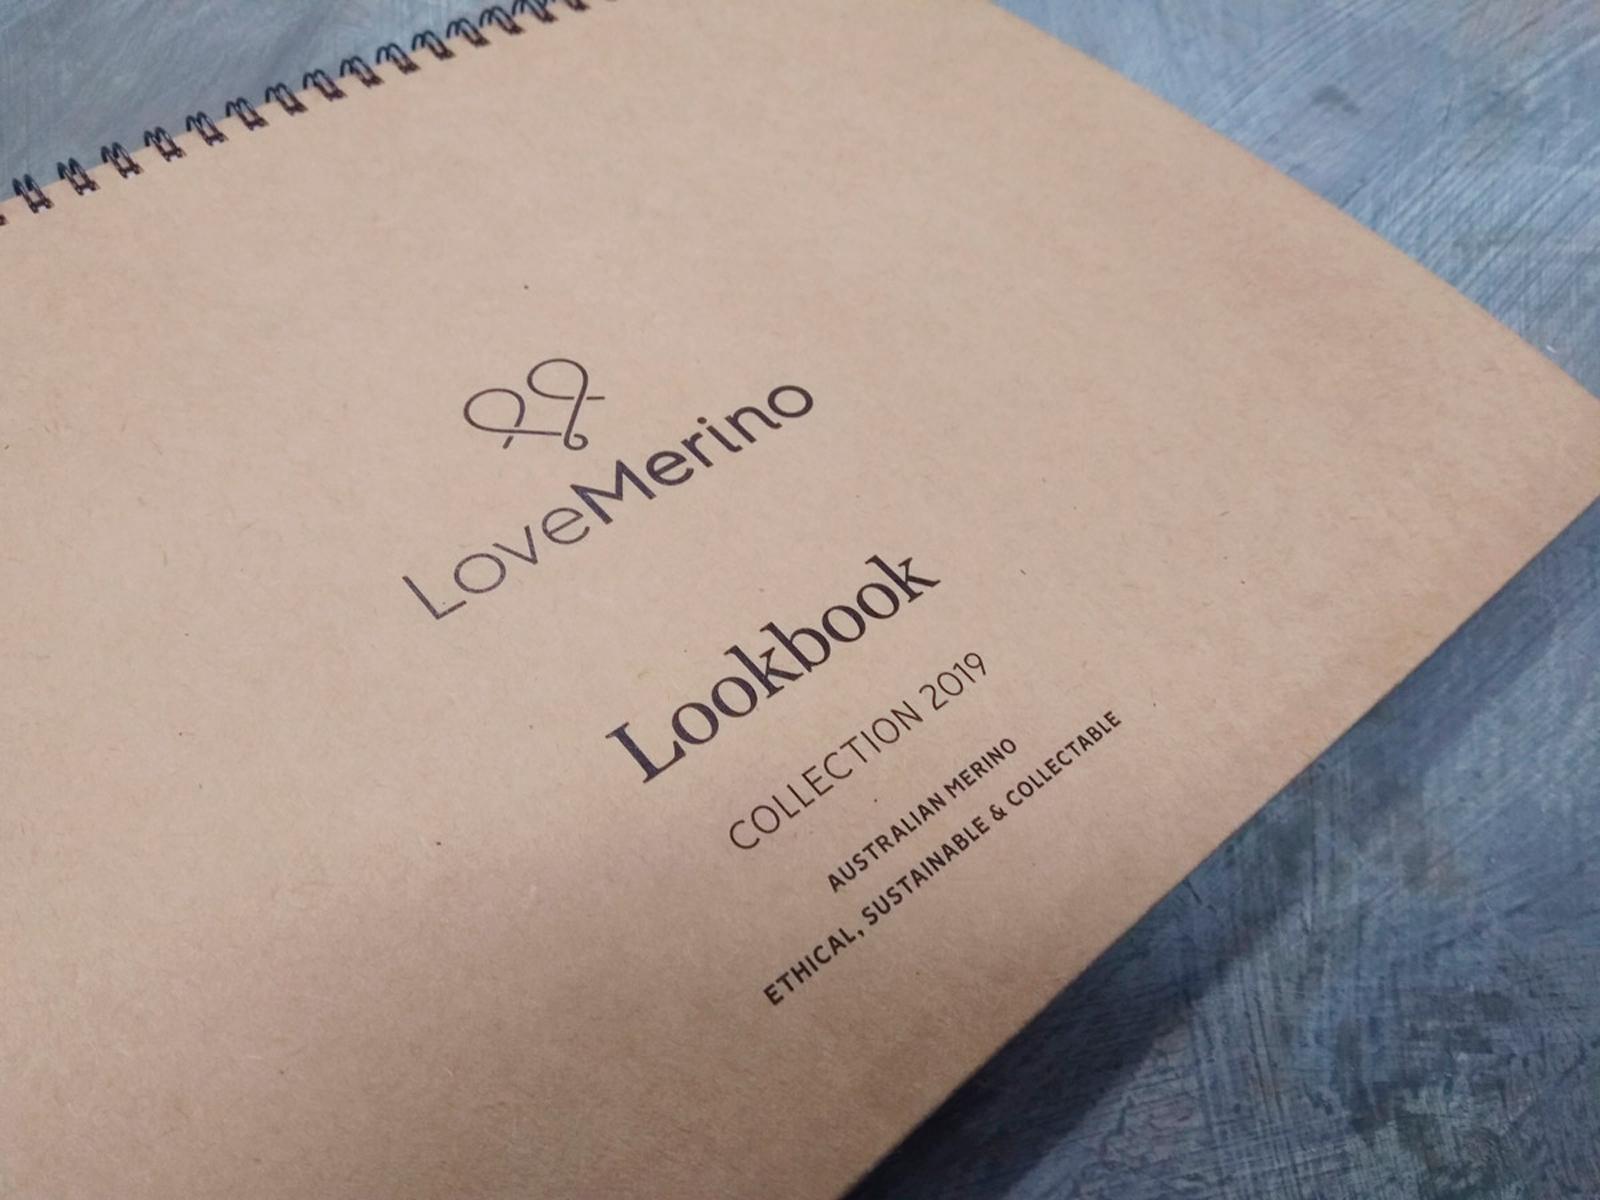 Love-Merino-look-book-design-cover-detail-1600